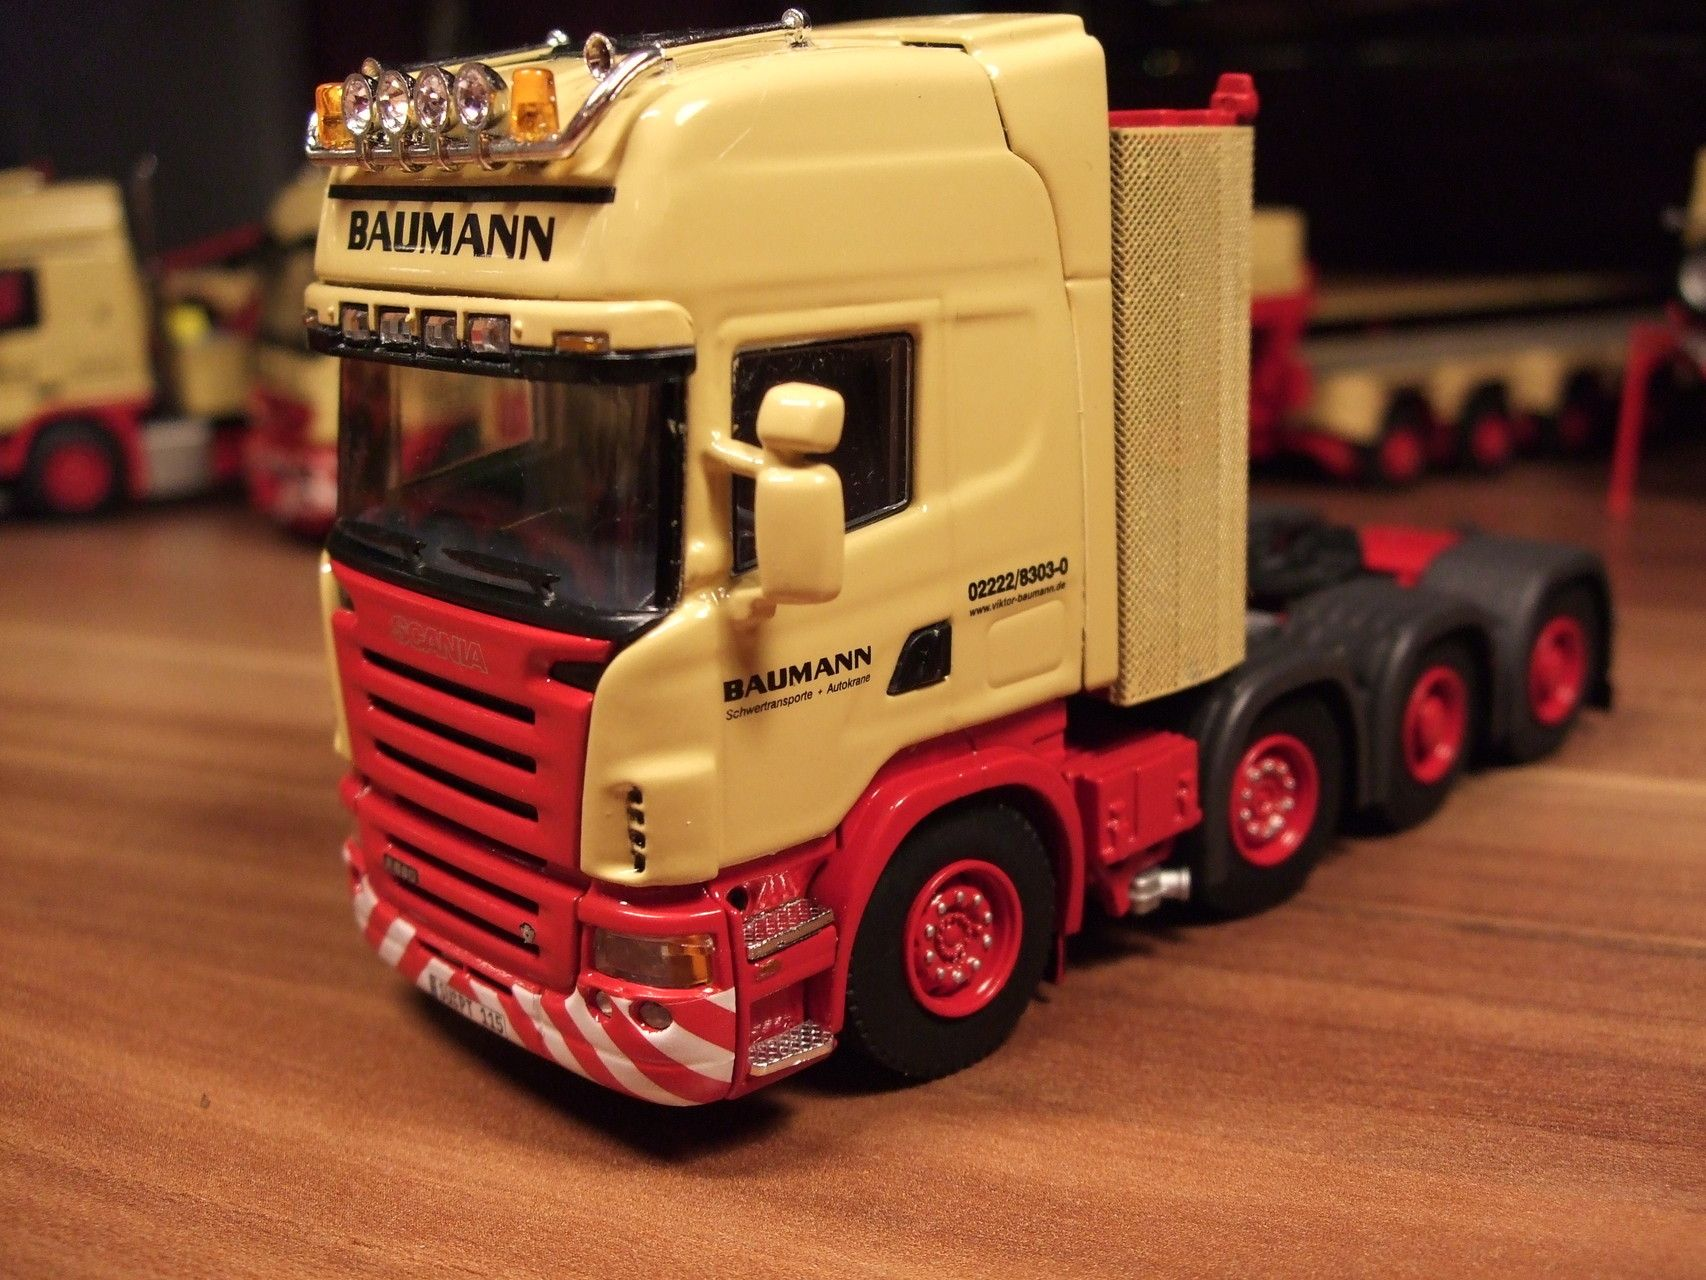 wsi scania baumann modelle eigenbau modellbau trucks 1. Black Bedroom Furniture Sets. Home Design Ideas